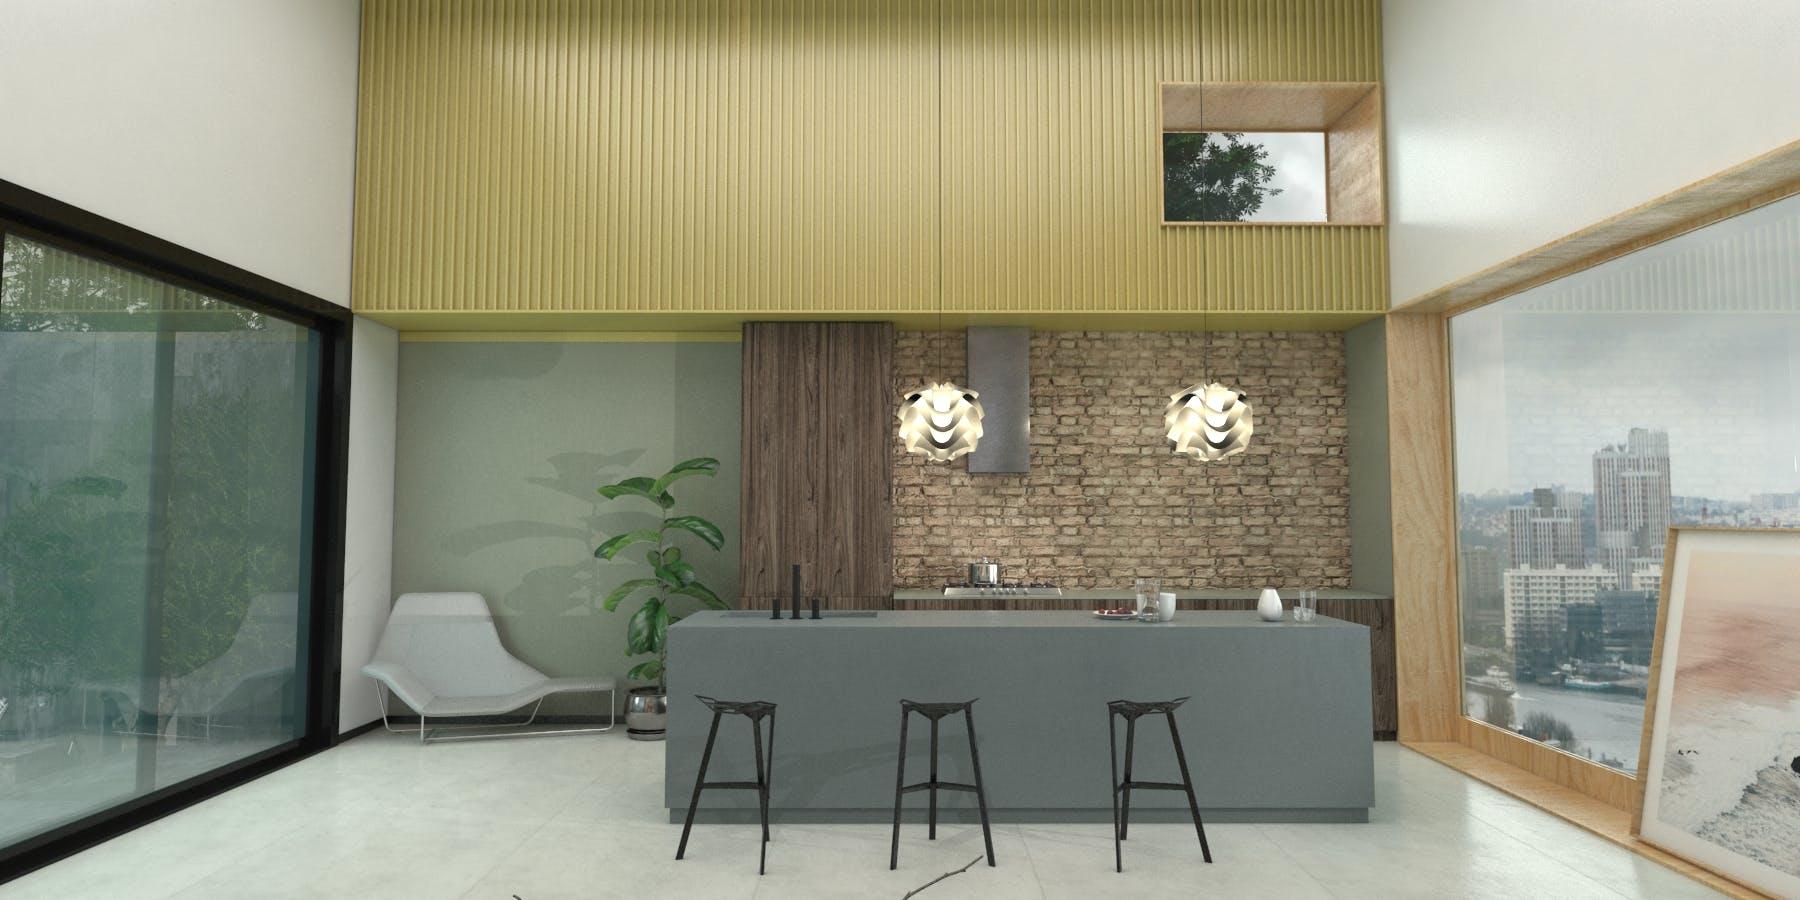 Image of Virtual stand Cosentino KBIS 2021 Kitchen 6 in Cosentino at KBIS 2021 - Cosentino